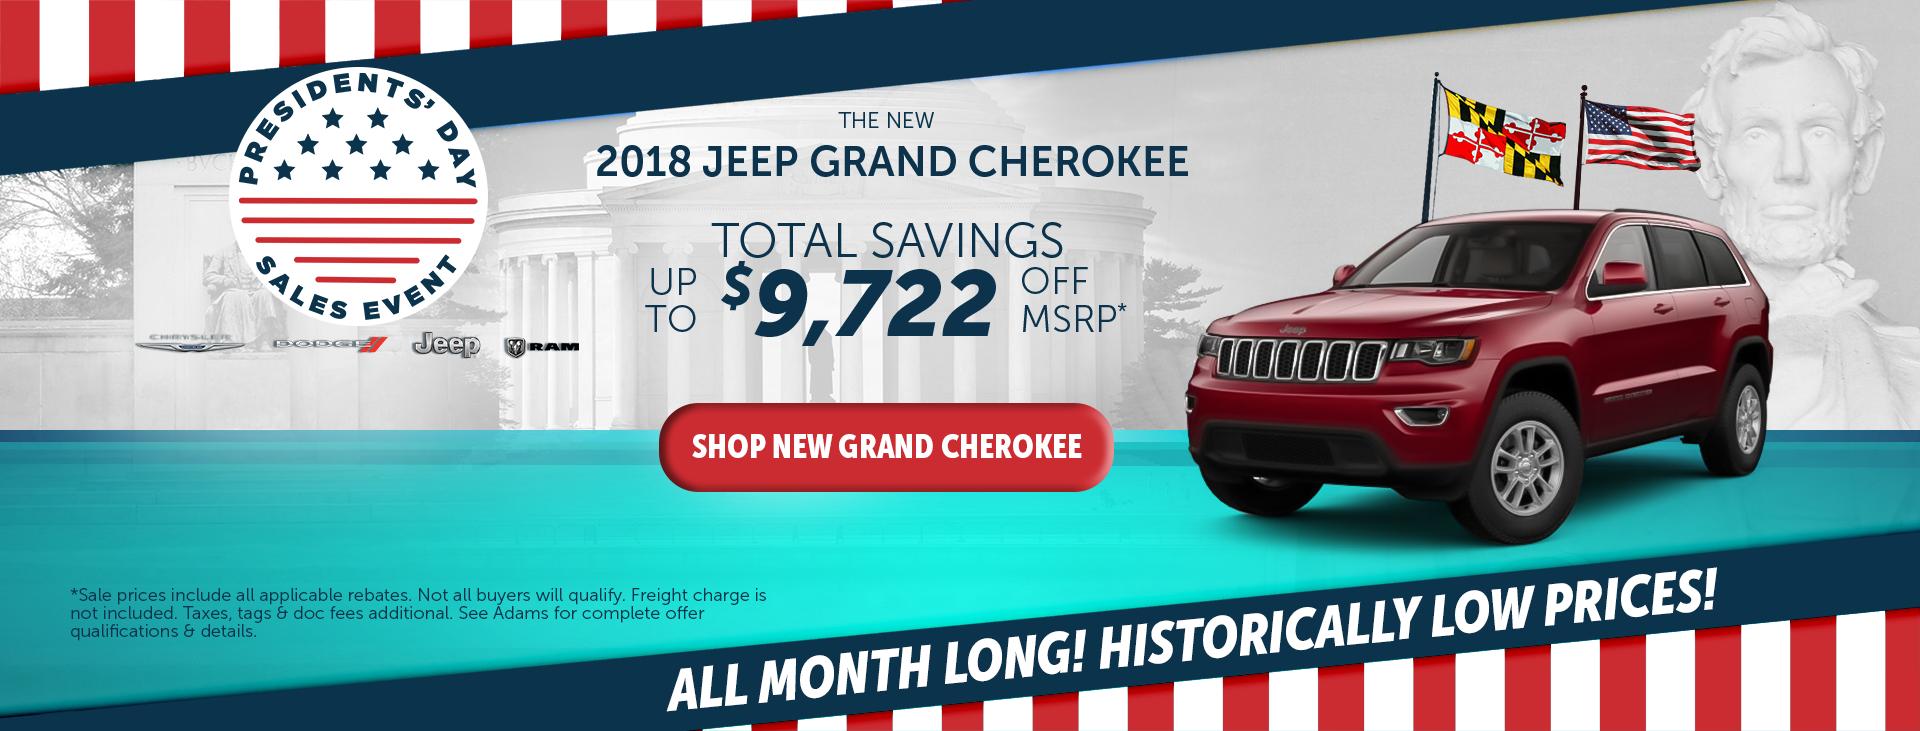 adams chrysler dodge jeep ram 2018 jeep grand cherokee